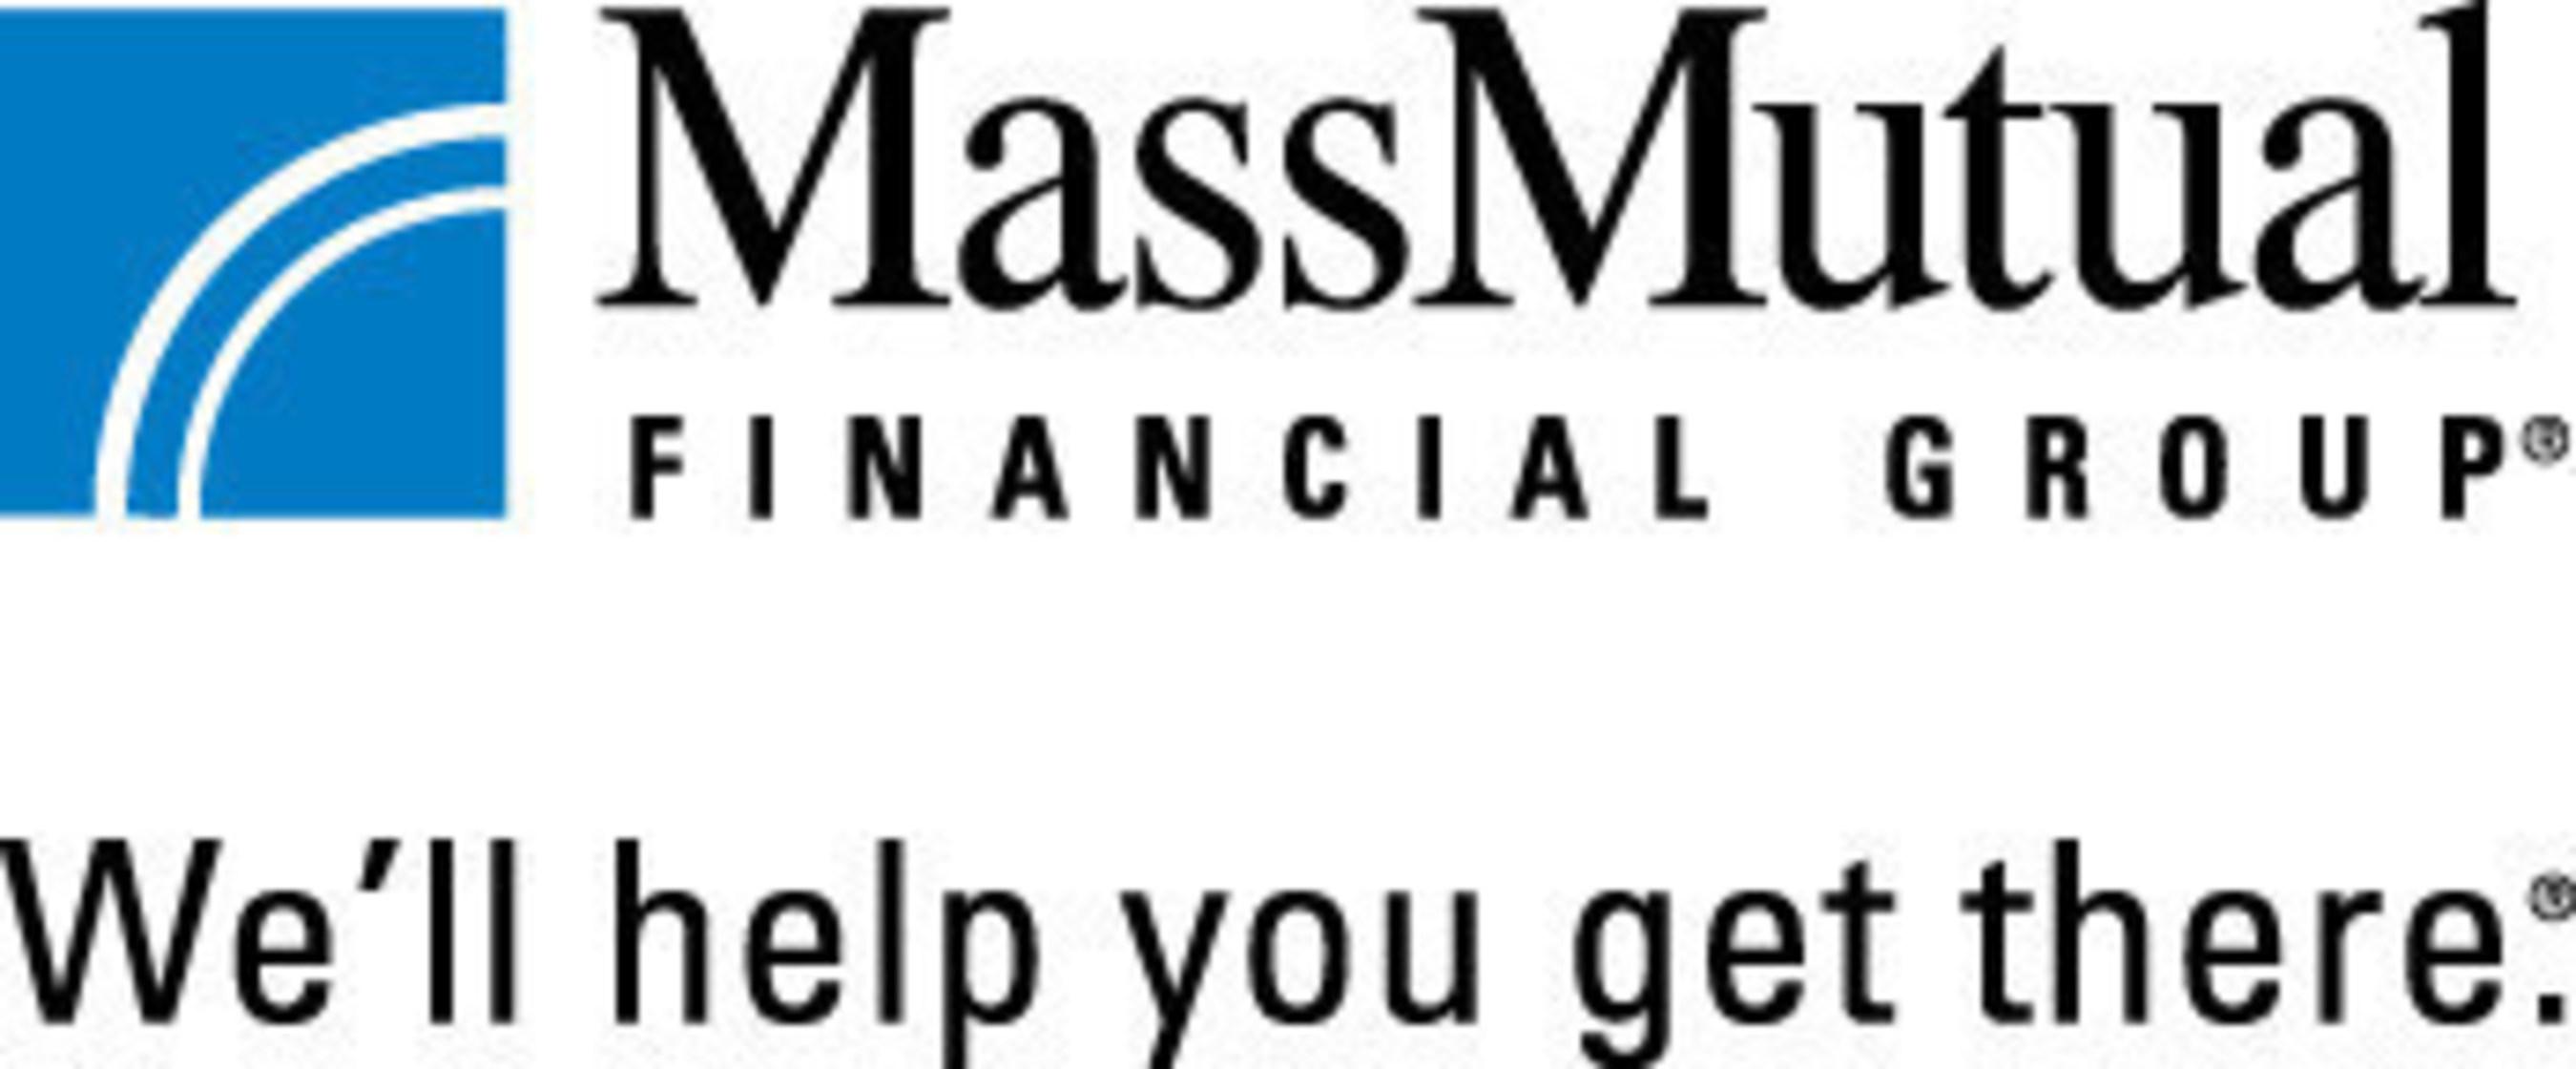 MassMutual Financial Group.